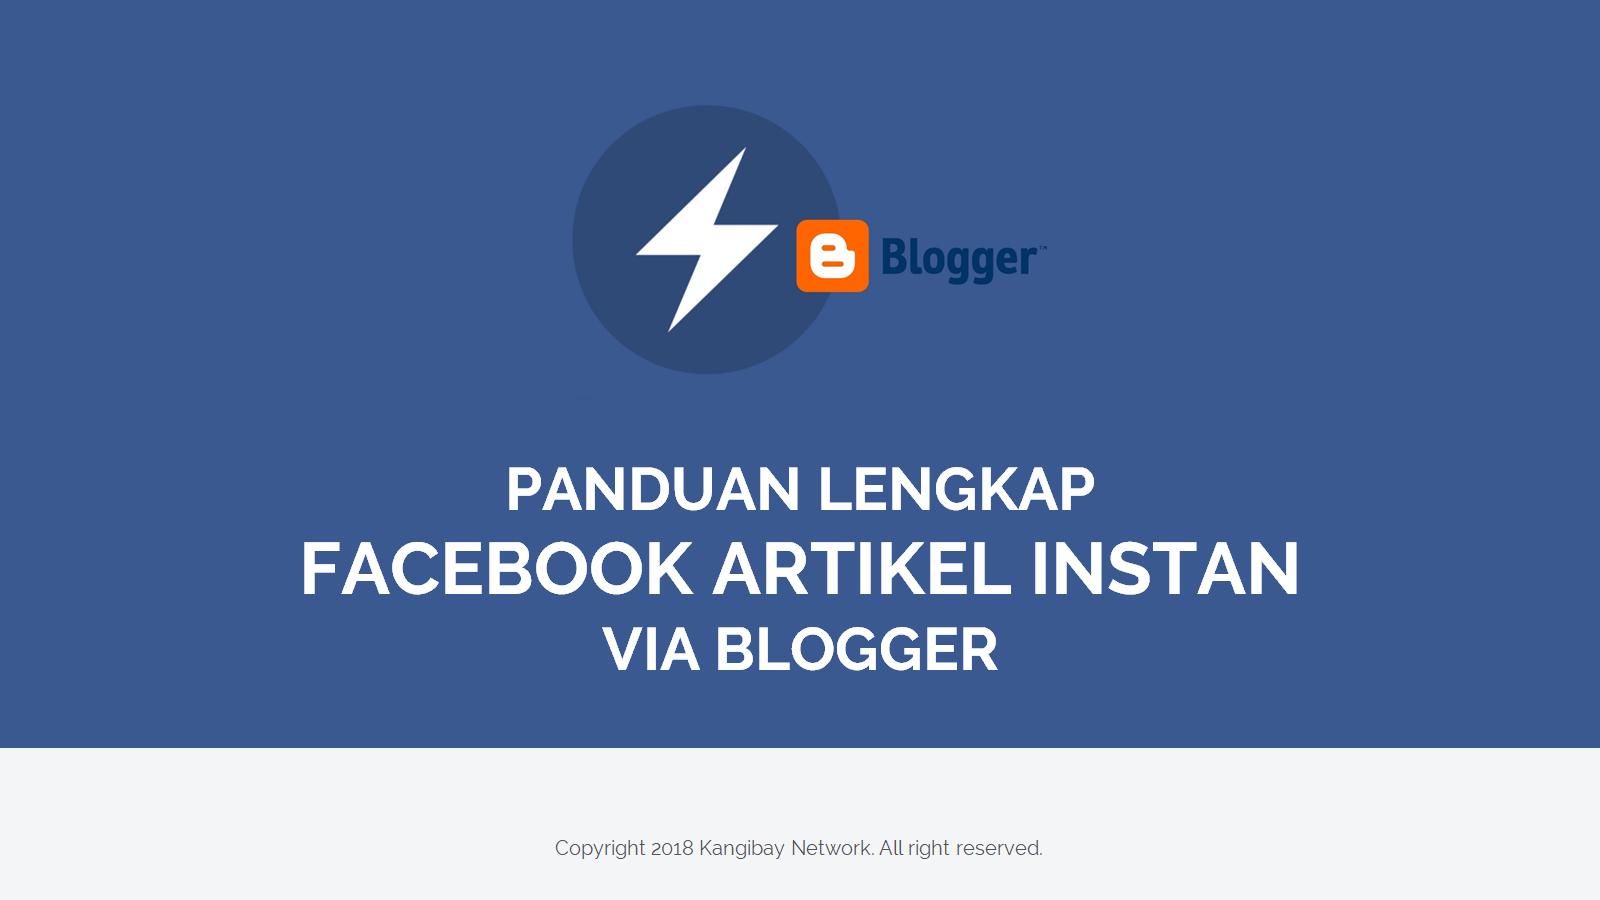 E-Book Mudah Daftar Setting dan Share Facebook Instant Article untuk Blogger